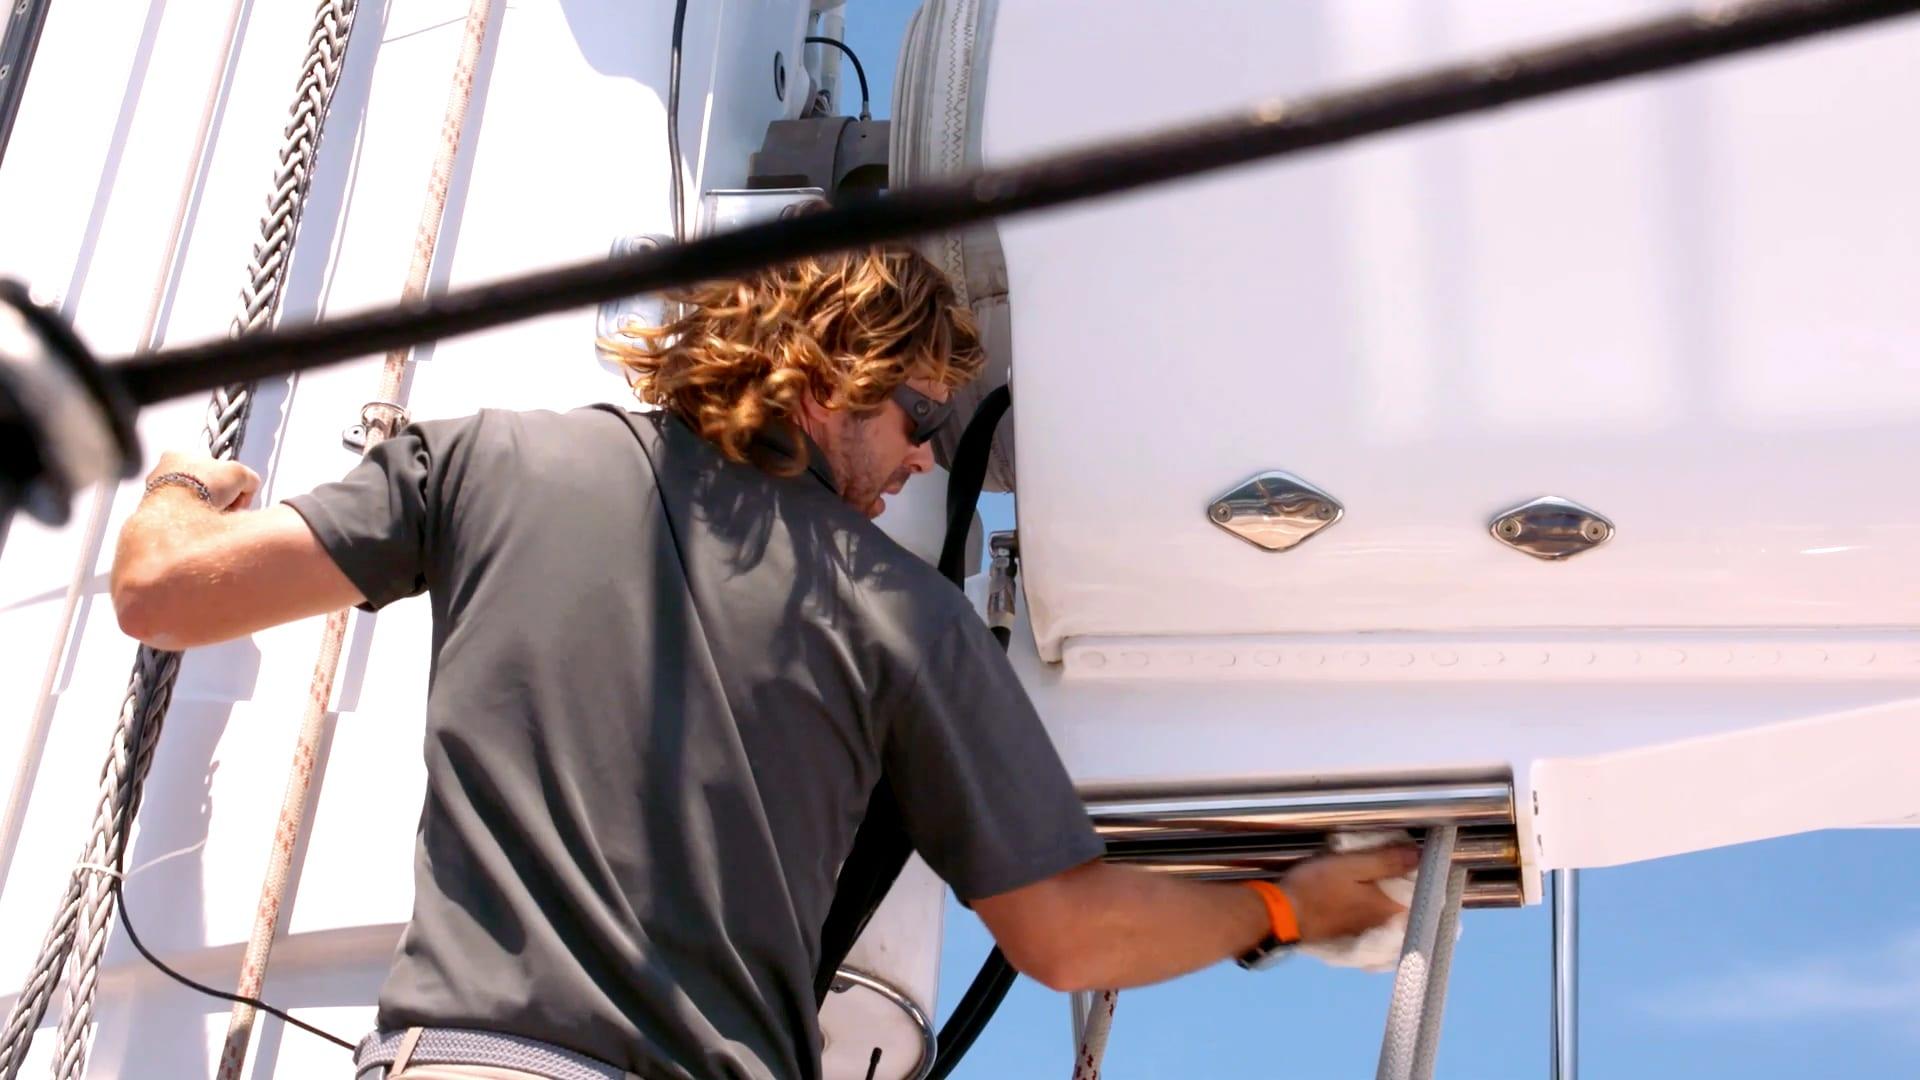 Preview: Below Deck Sailing Yacht Season 2 Episode 14